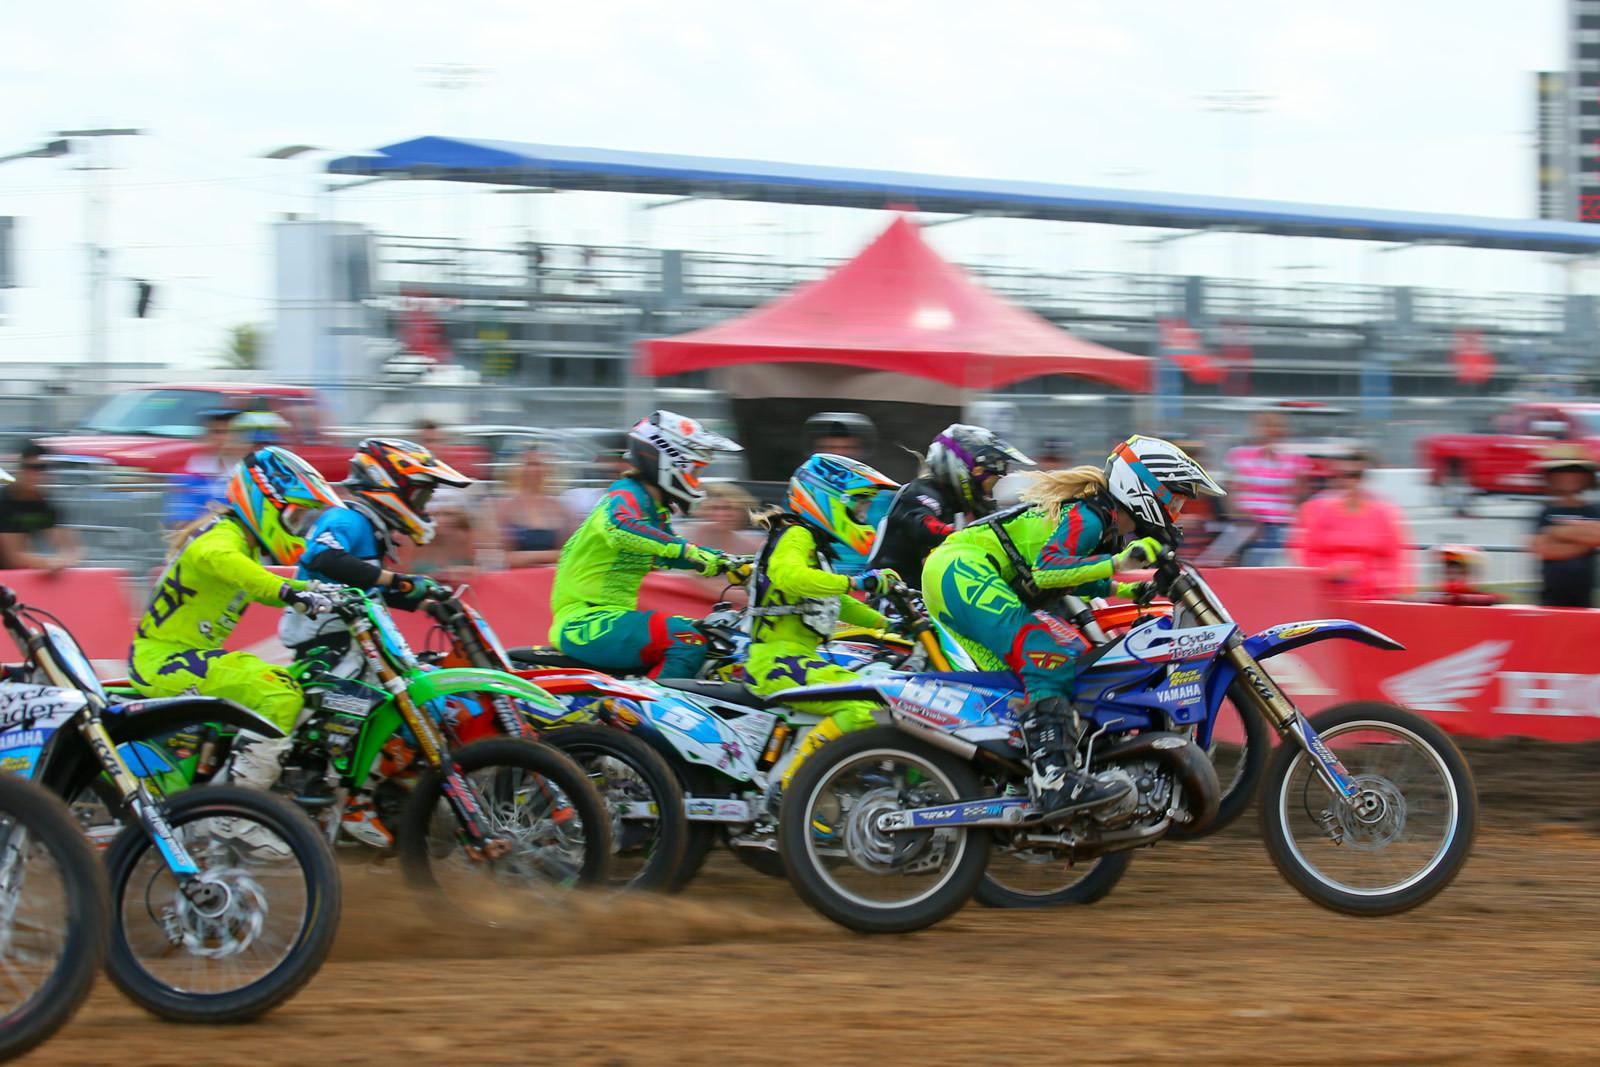 WMX - 2016 Ricky Carmichael Amateur Supercross - Motocross Pictures - Vital MX